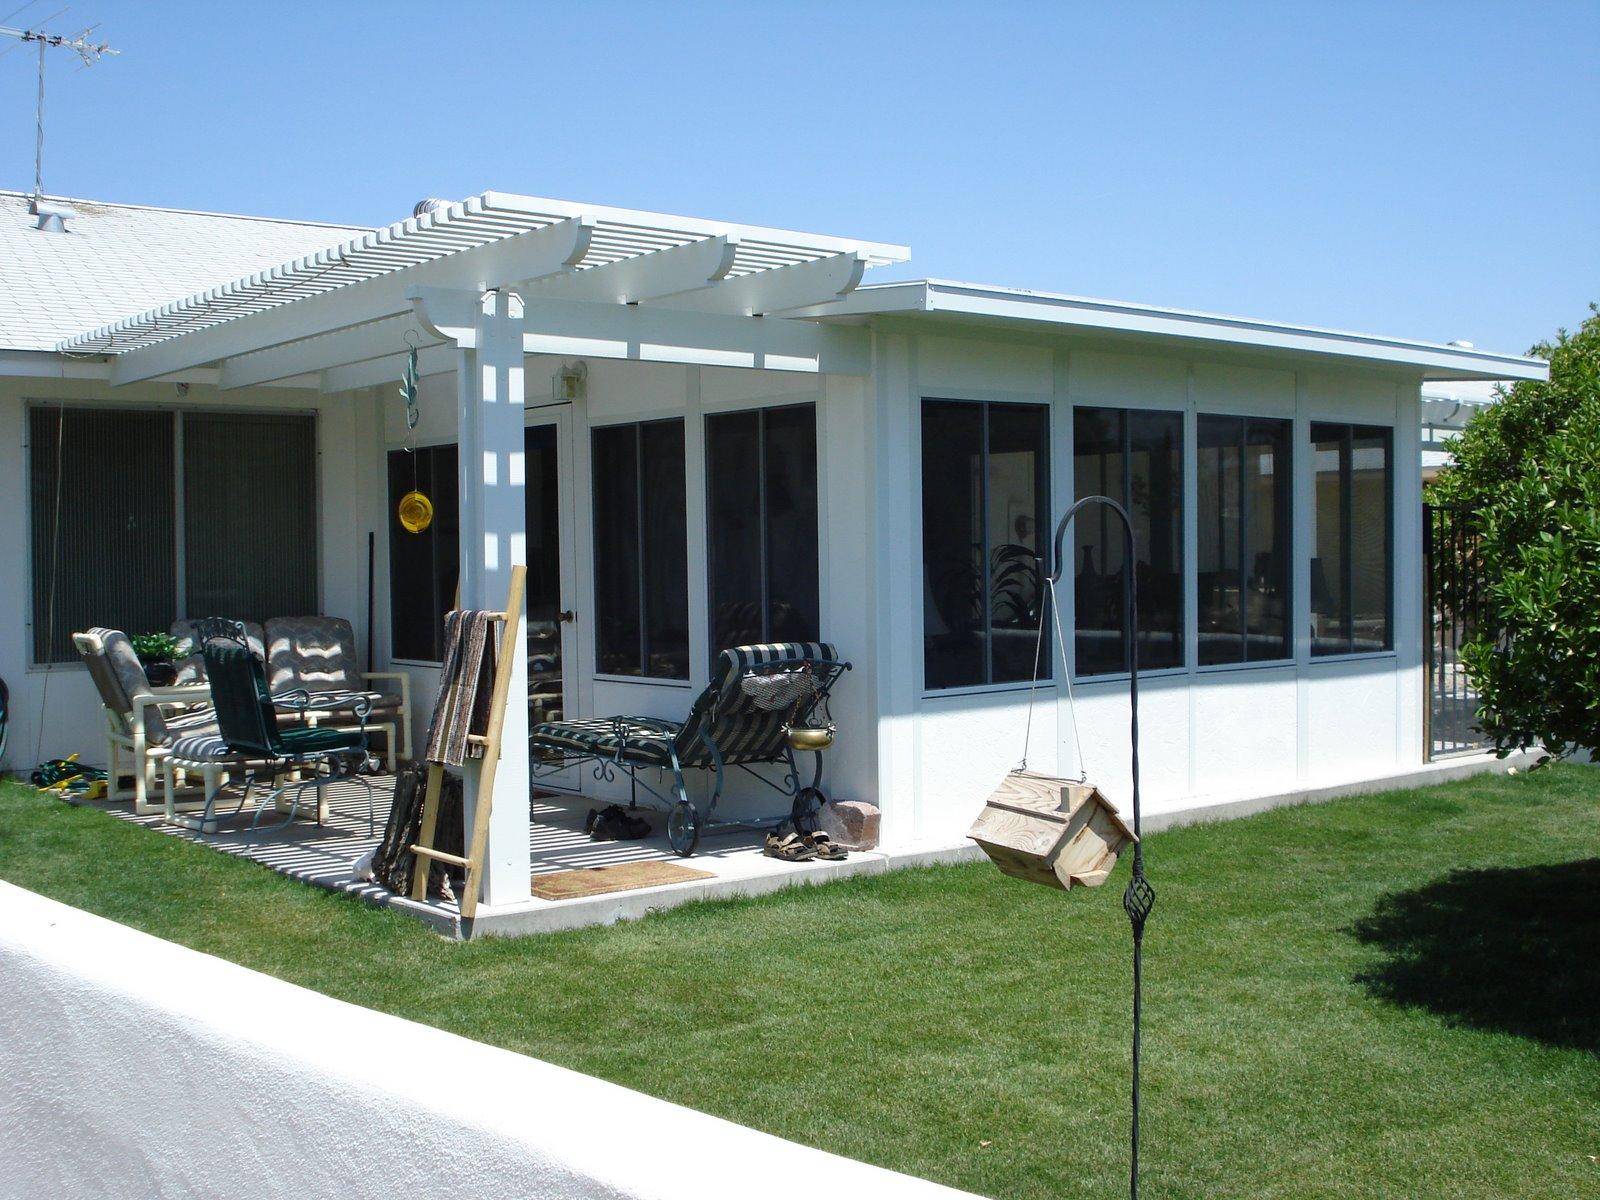 Modular sunroom in sun city arizona arizona enclosures for Modular sunrooms